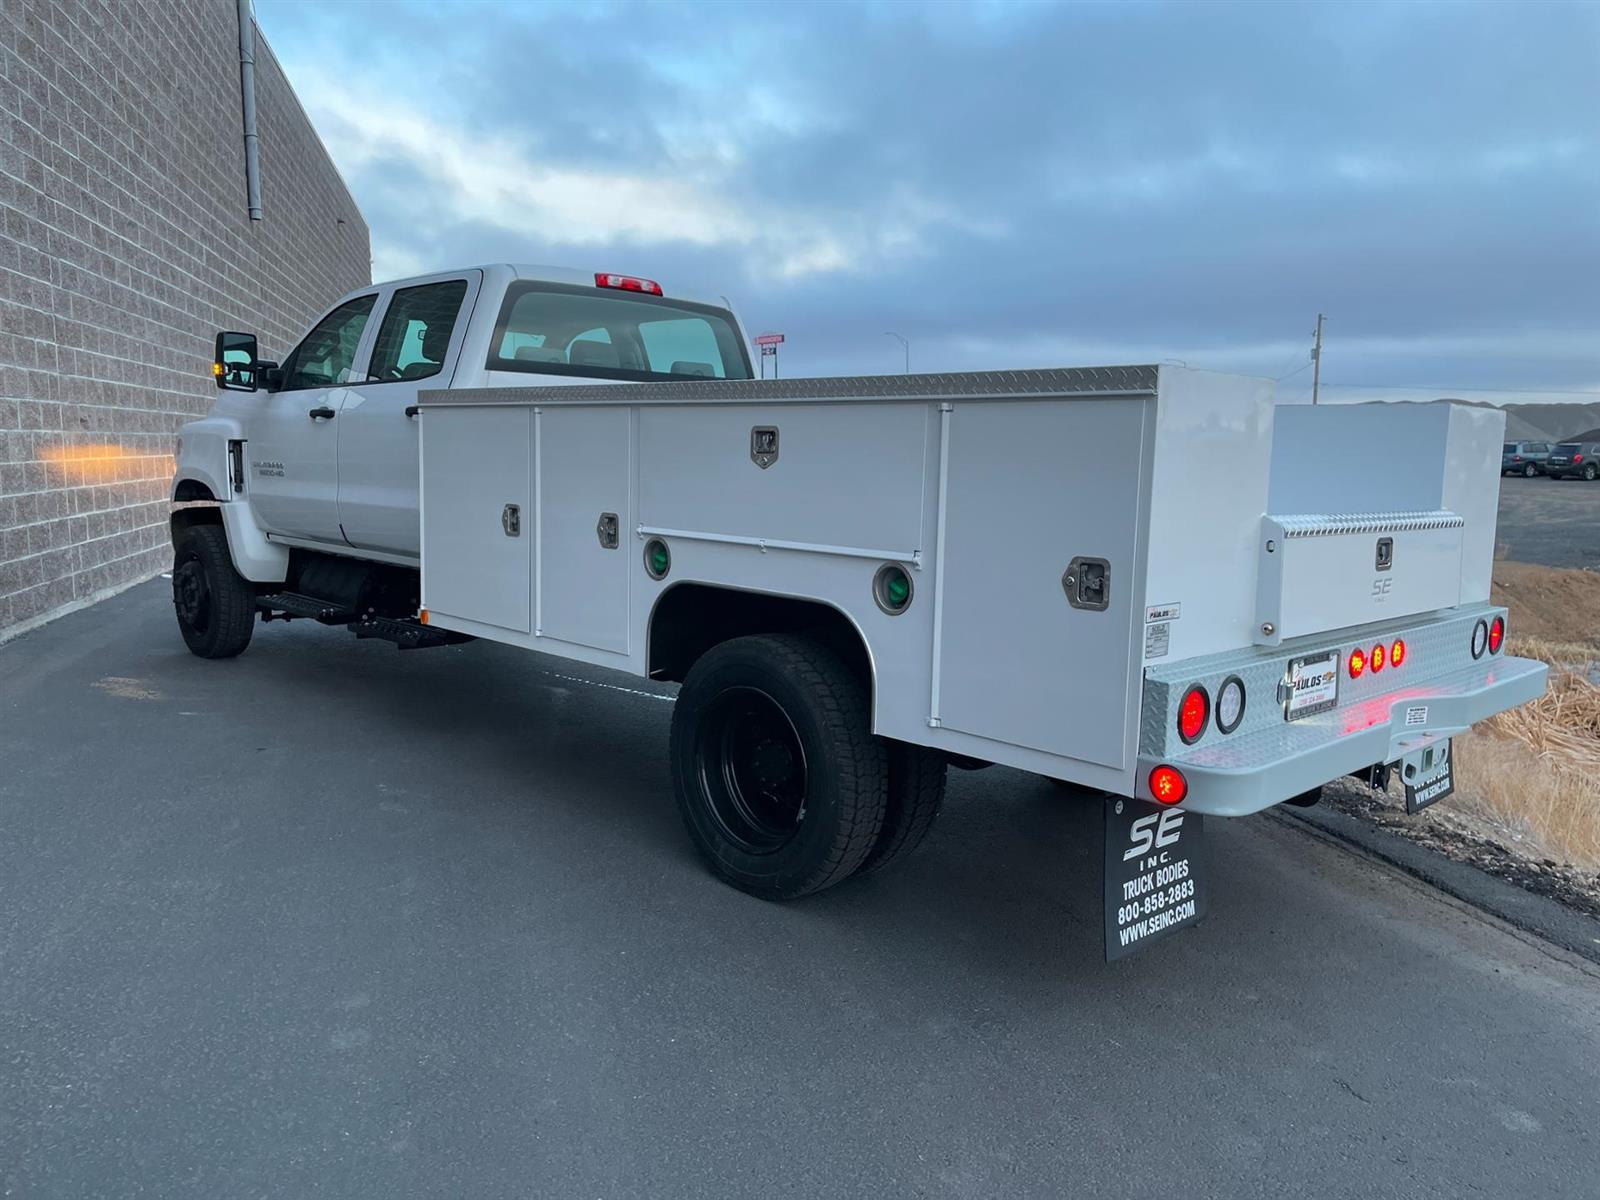 2020 Chevrolet Silverado 5500 Crew Cab DRW 4x4, Scelzi Service Body #352188 - photo 1